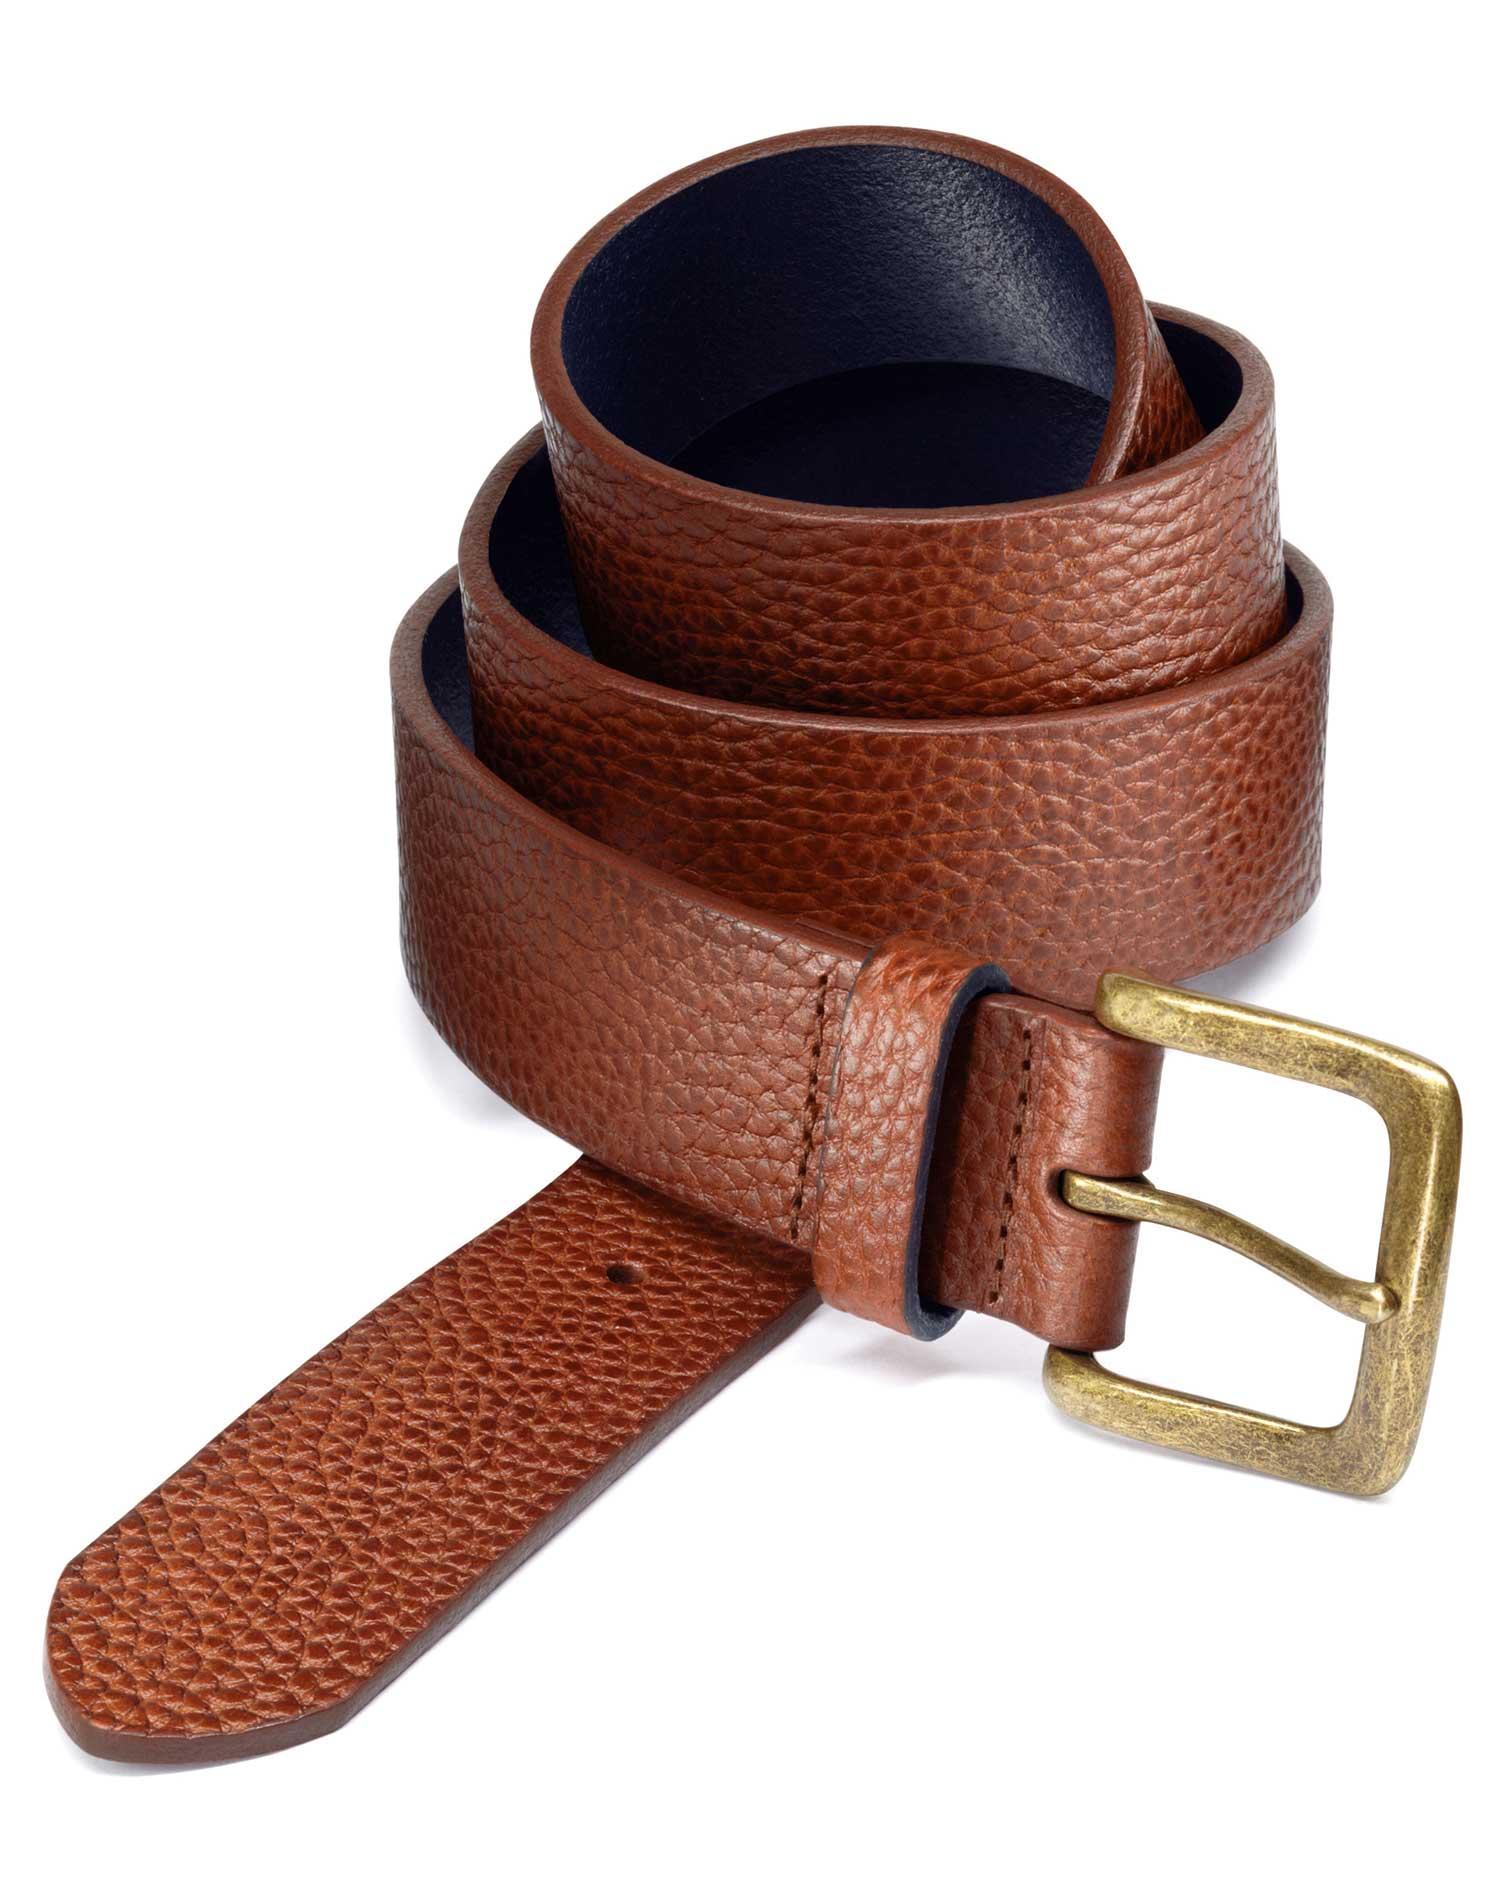 Tan Pebbled Leather Belt Size 30-32 by Charles Tyrwhitt